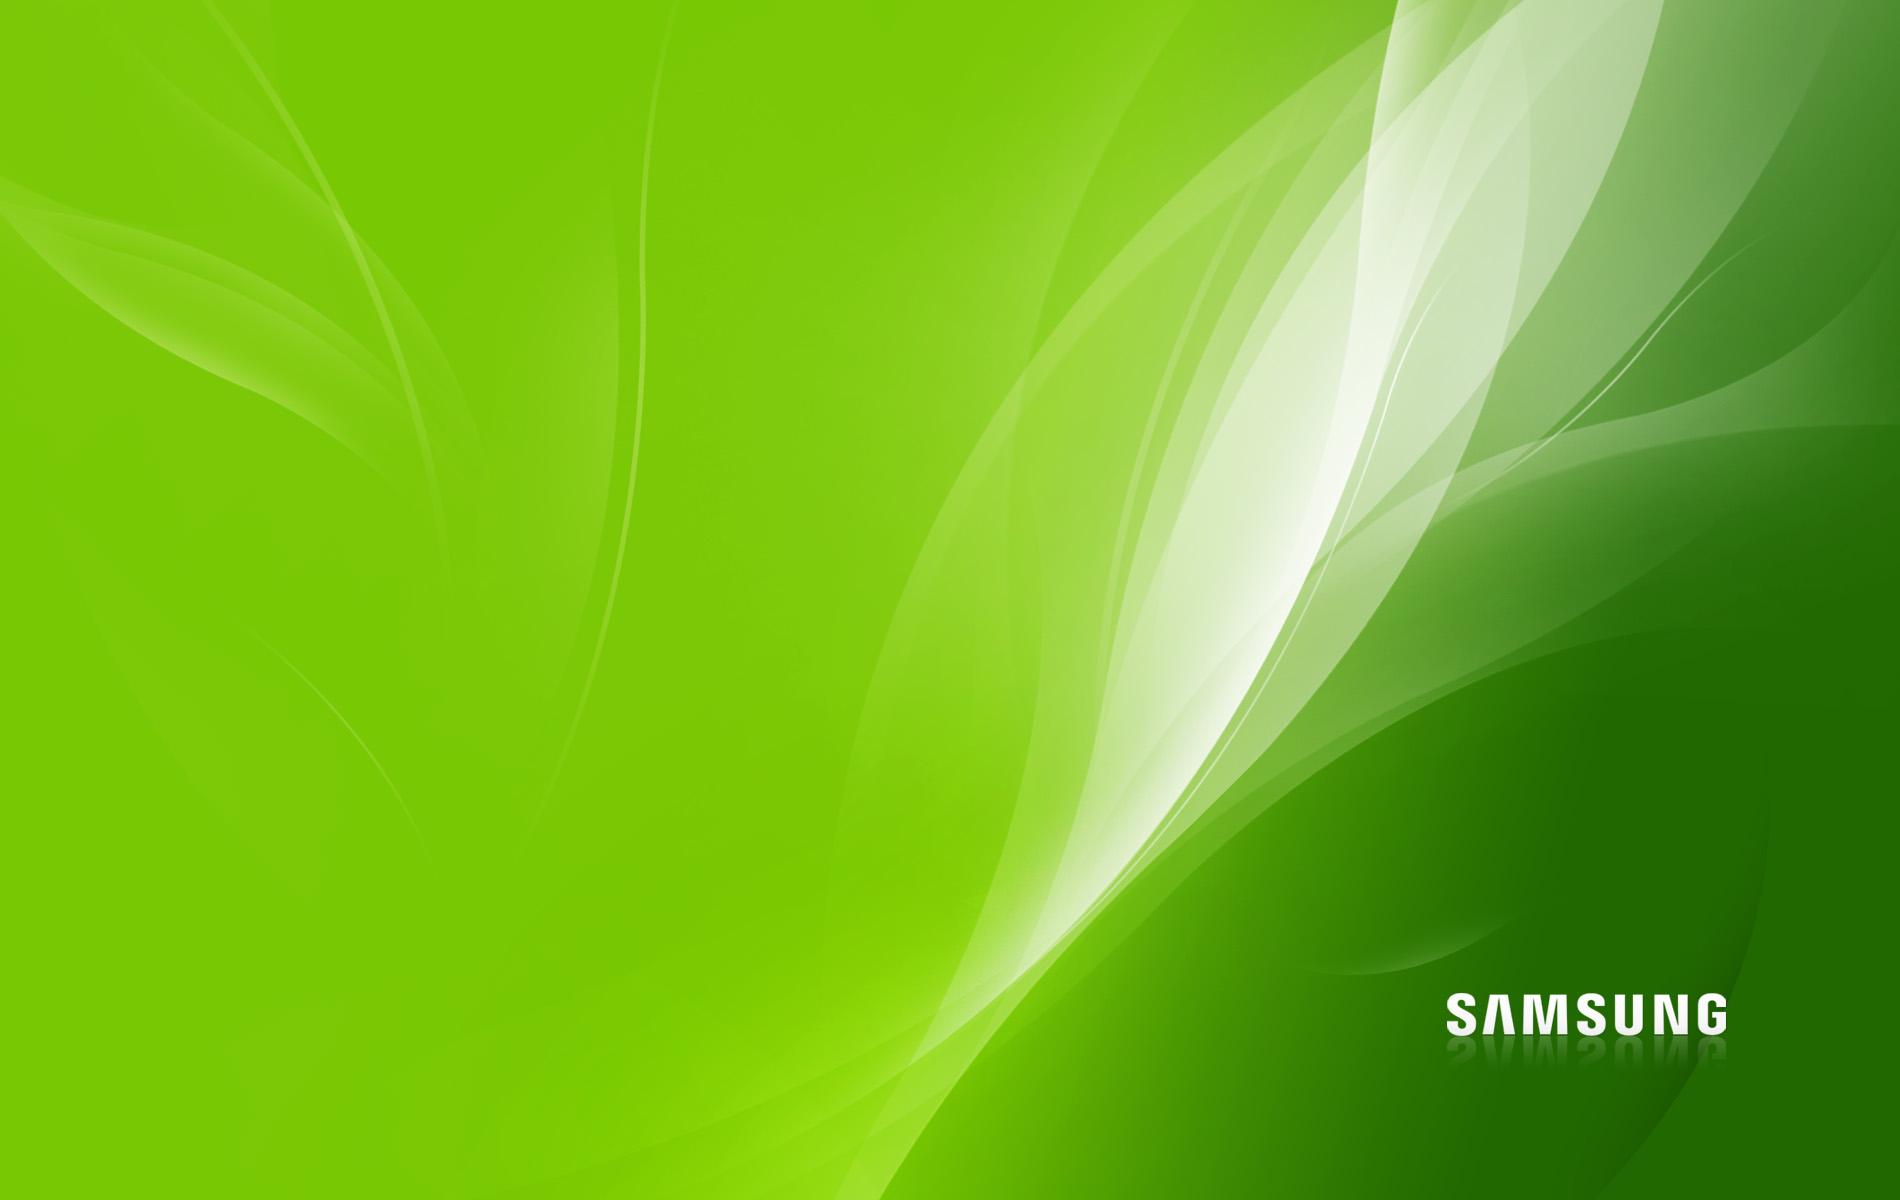 Samsung Wallpapers Pc Doctor Ardee Samsung Wallpaper Hd For Pc 1900x1200 Download Hd Wallpaper Wallpapertip